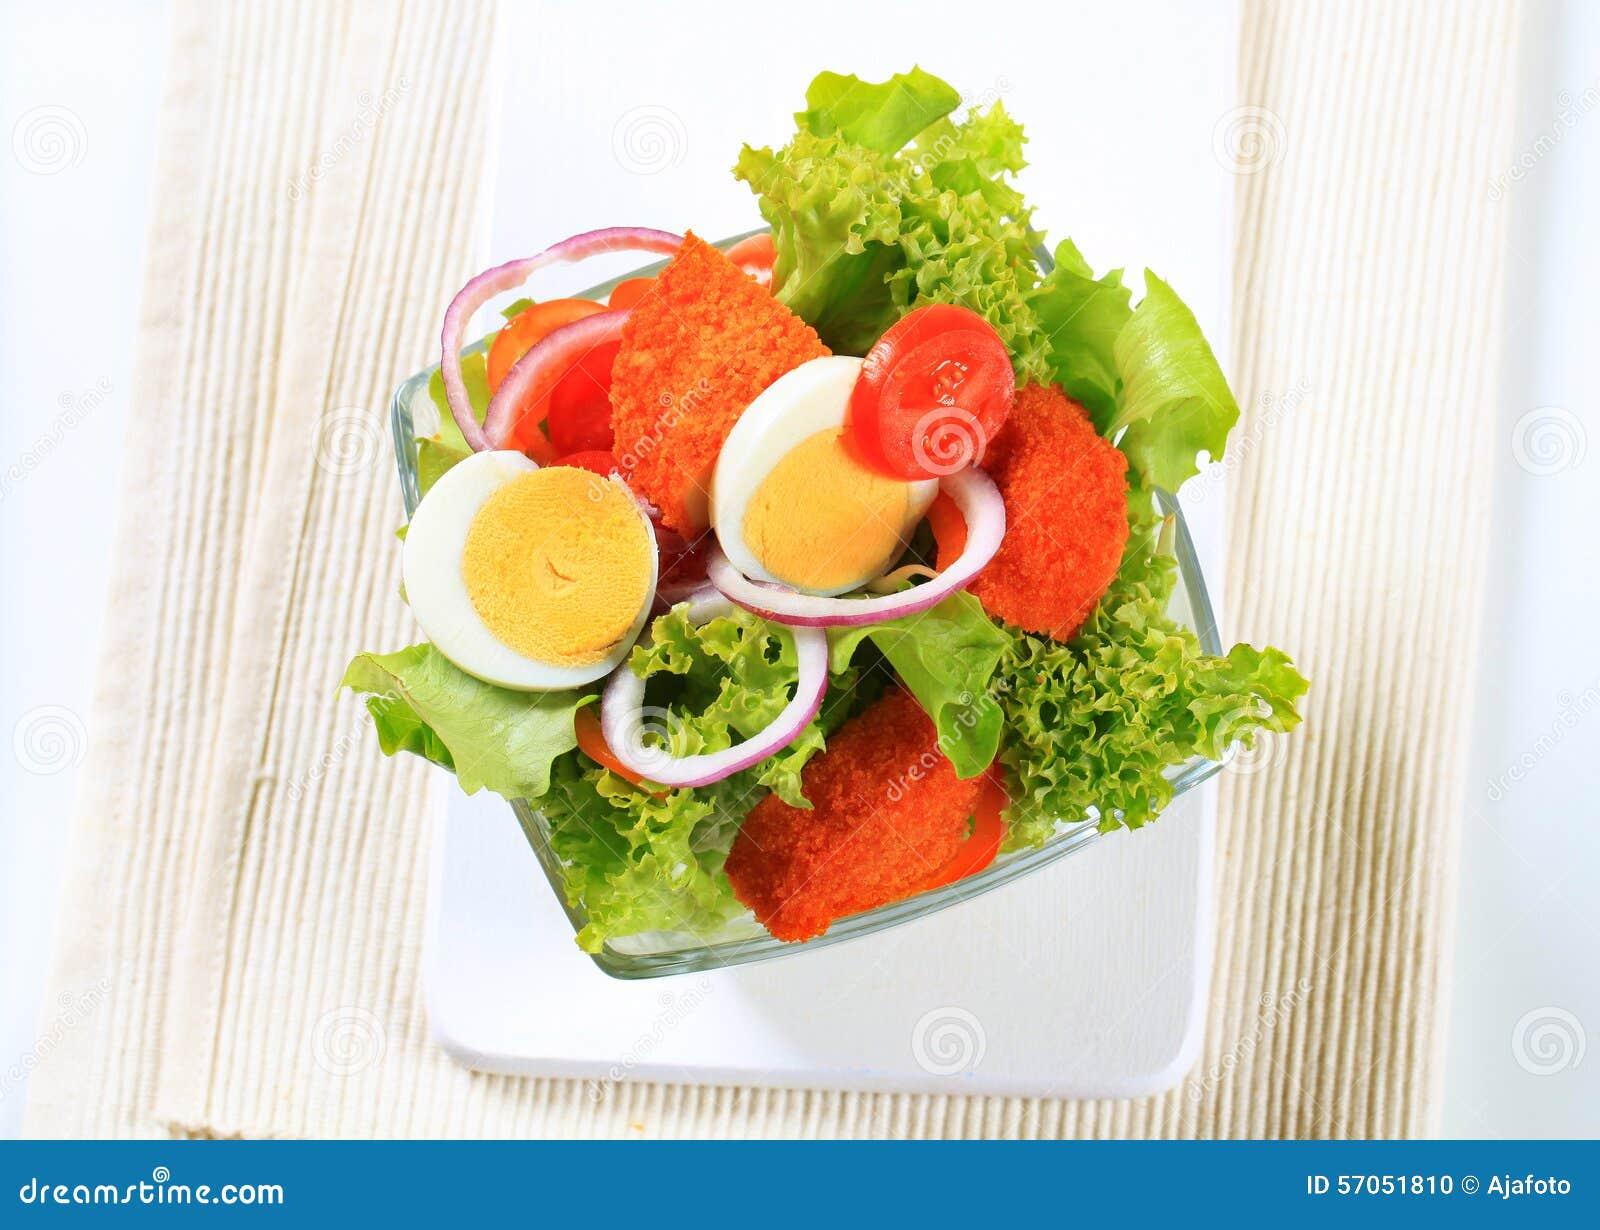 Verse salade met gebraden gepaneerd kaas en ei